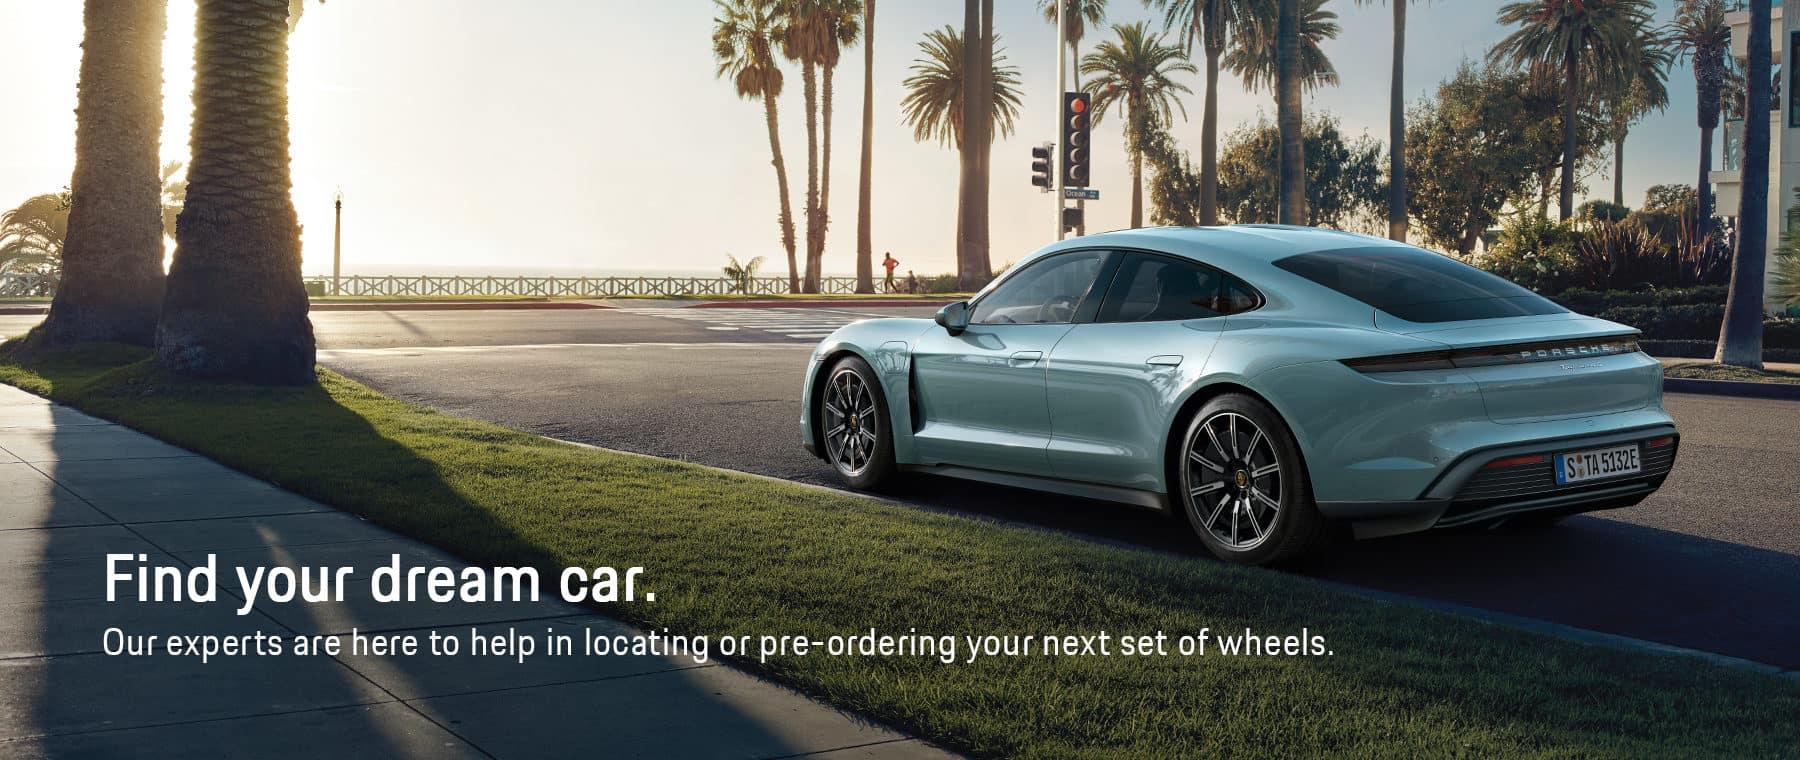 Holman Porsche San Diego Pre-Order Dream Car